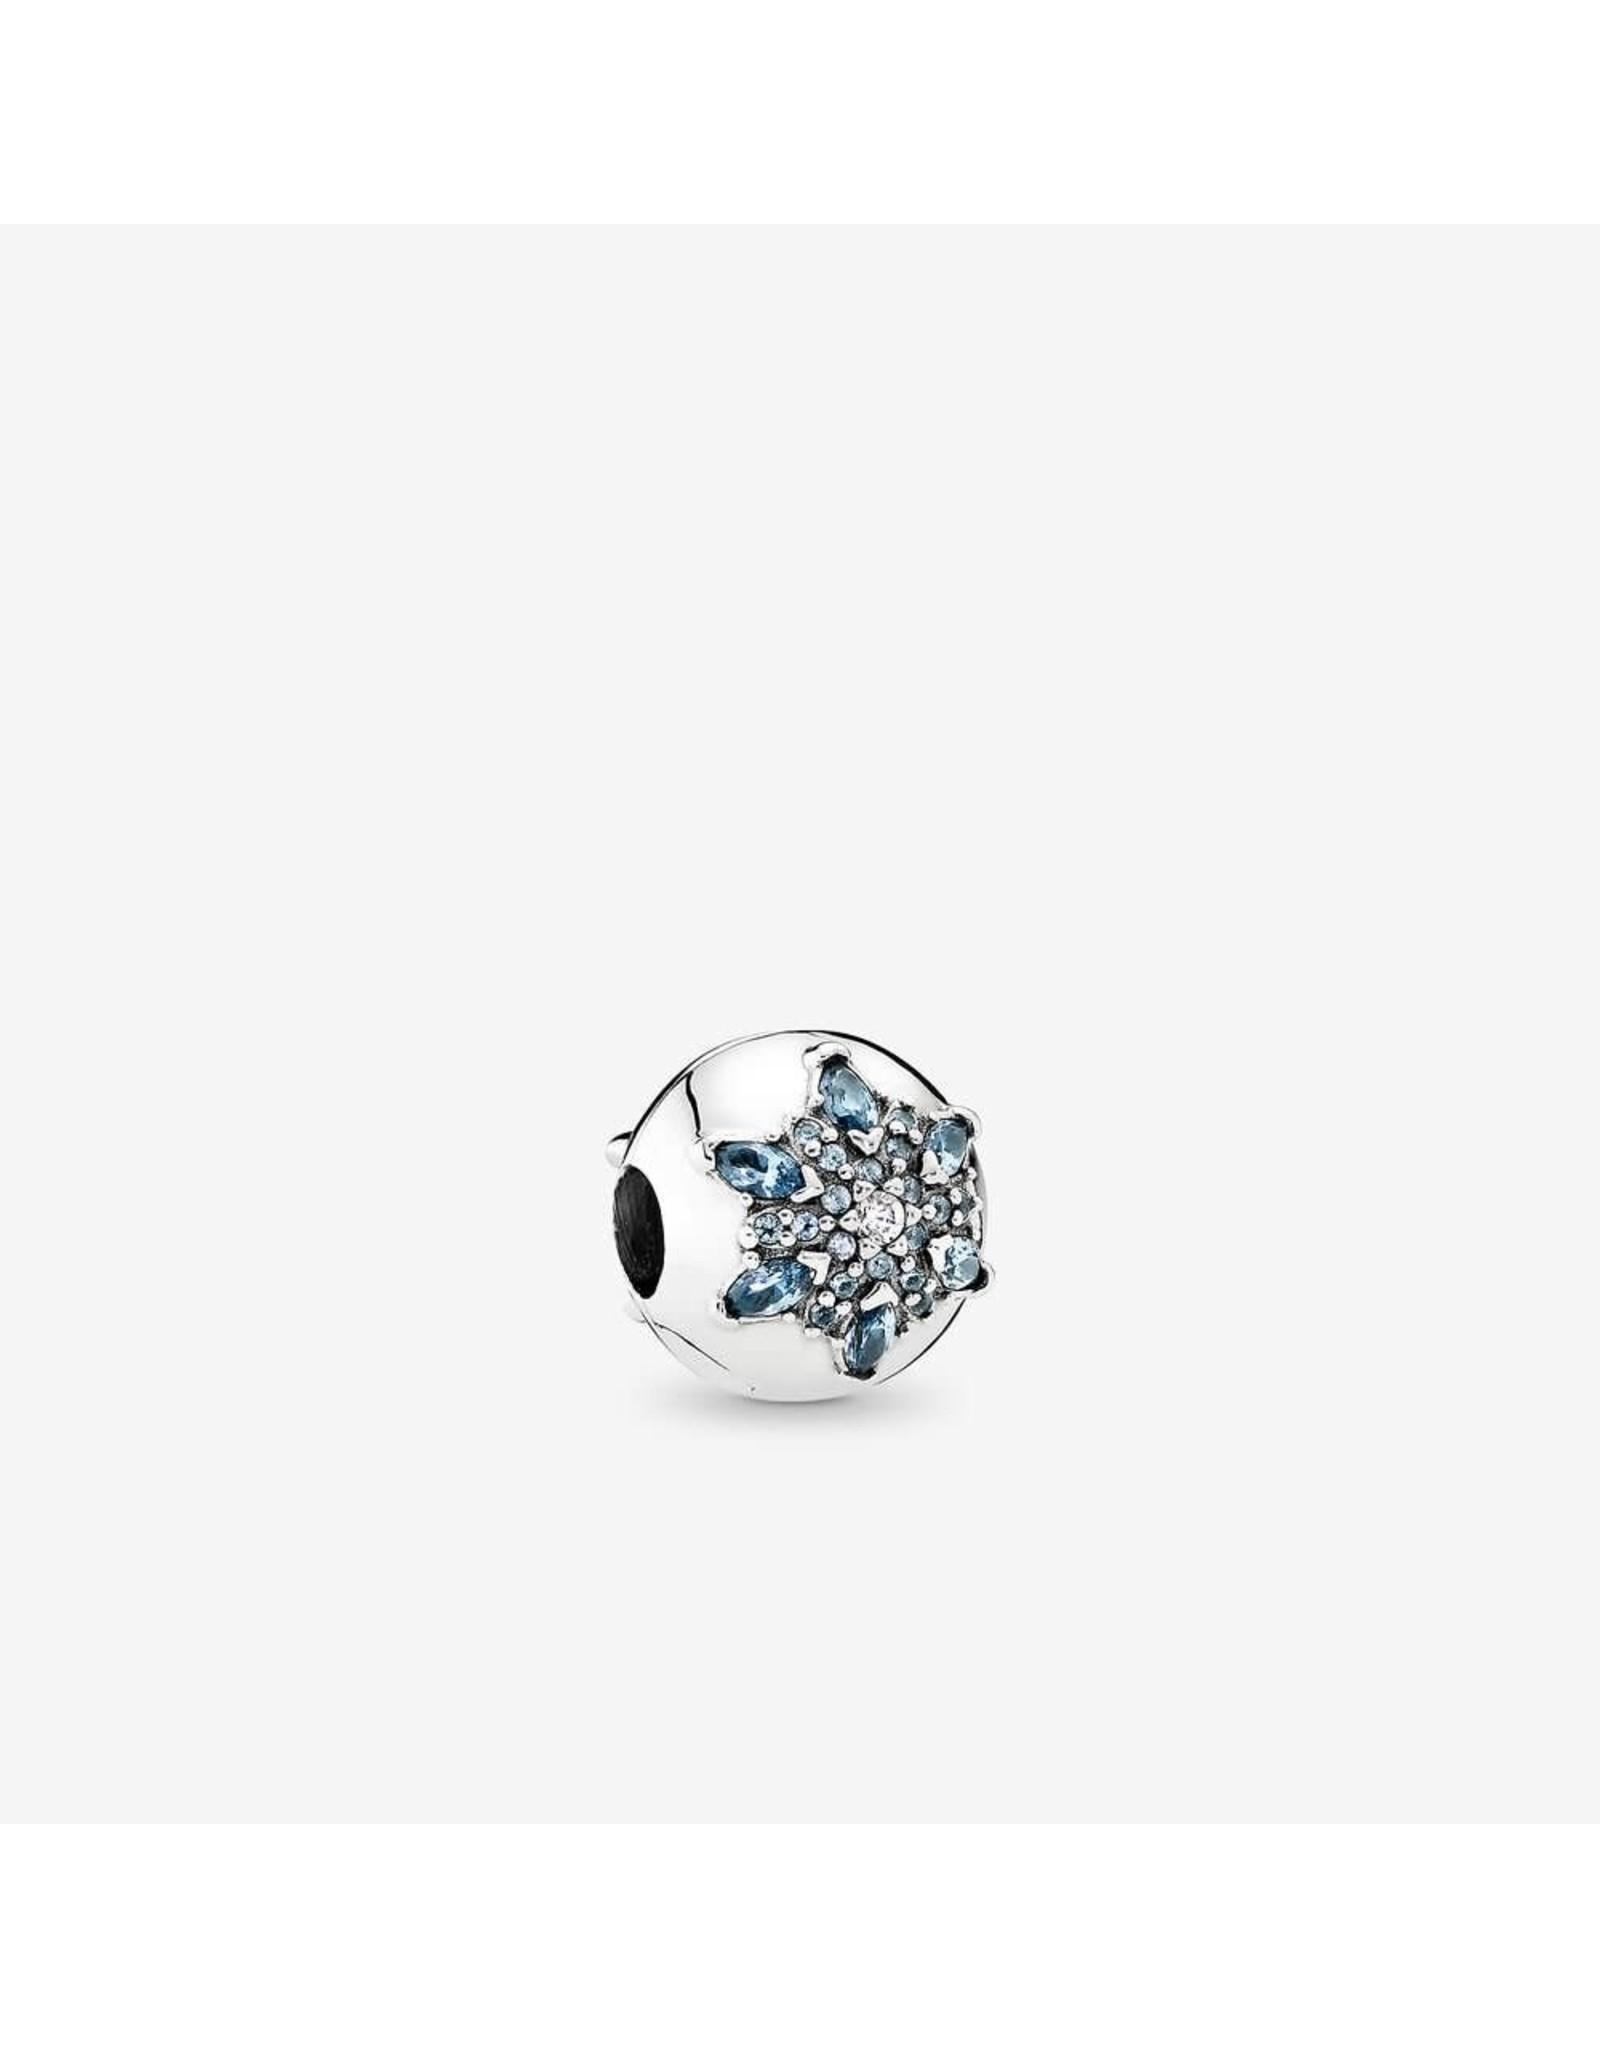 Pandora Pandora Clip, Crystallised Snowflake, Multi-Coloured Crystal & Clear CZ